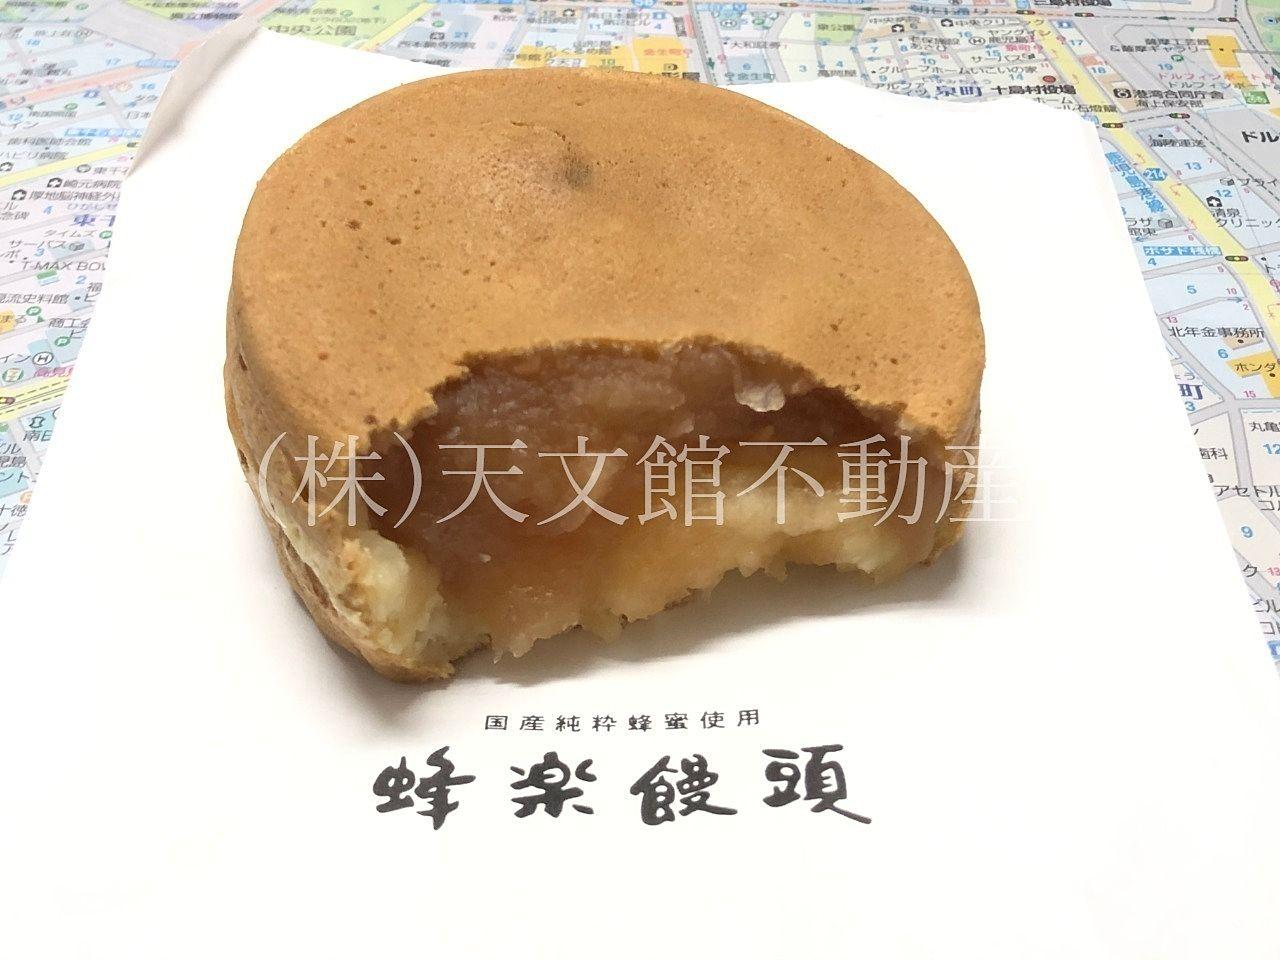 鹿児島市 天文館公園 美味しい 饅頭